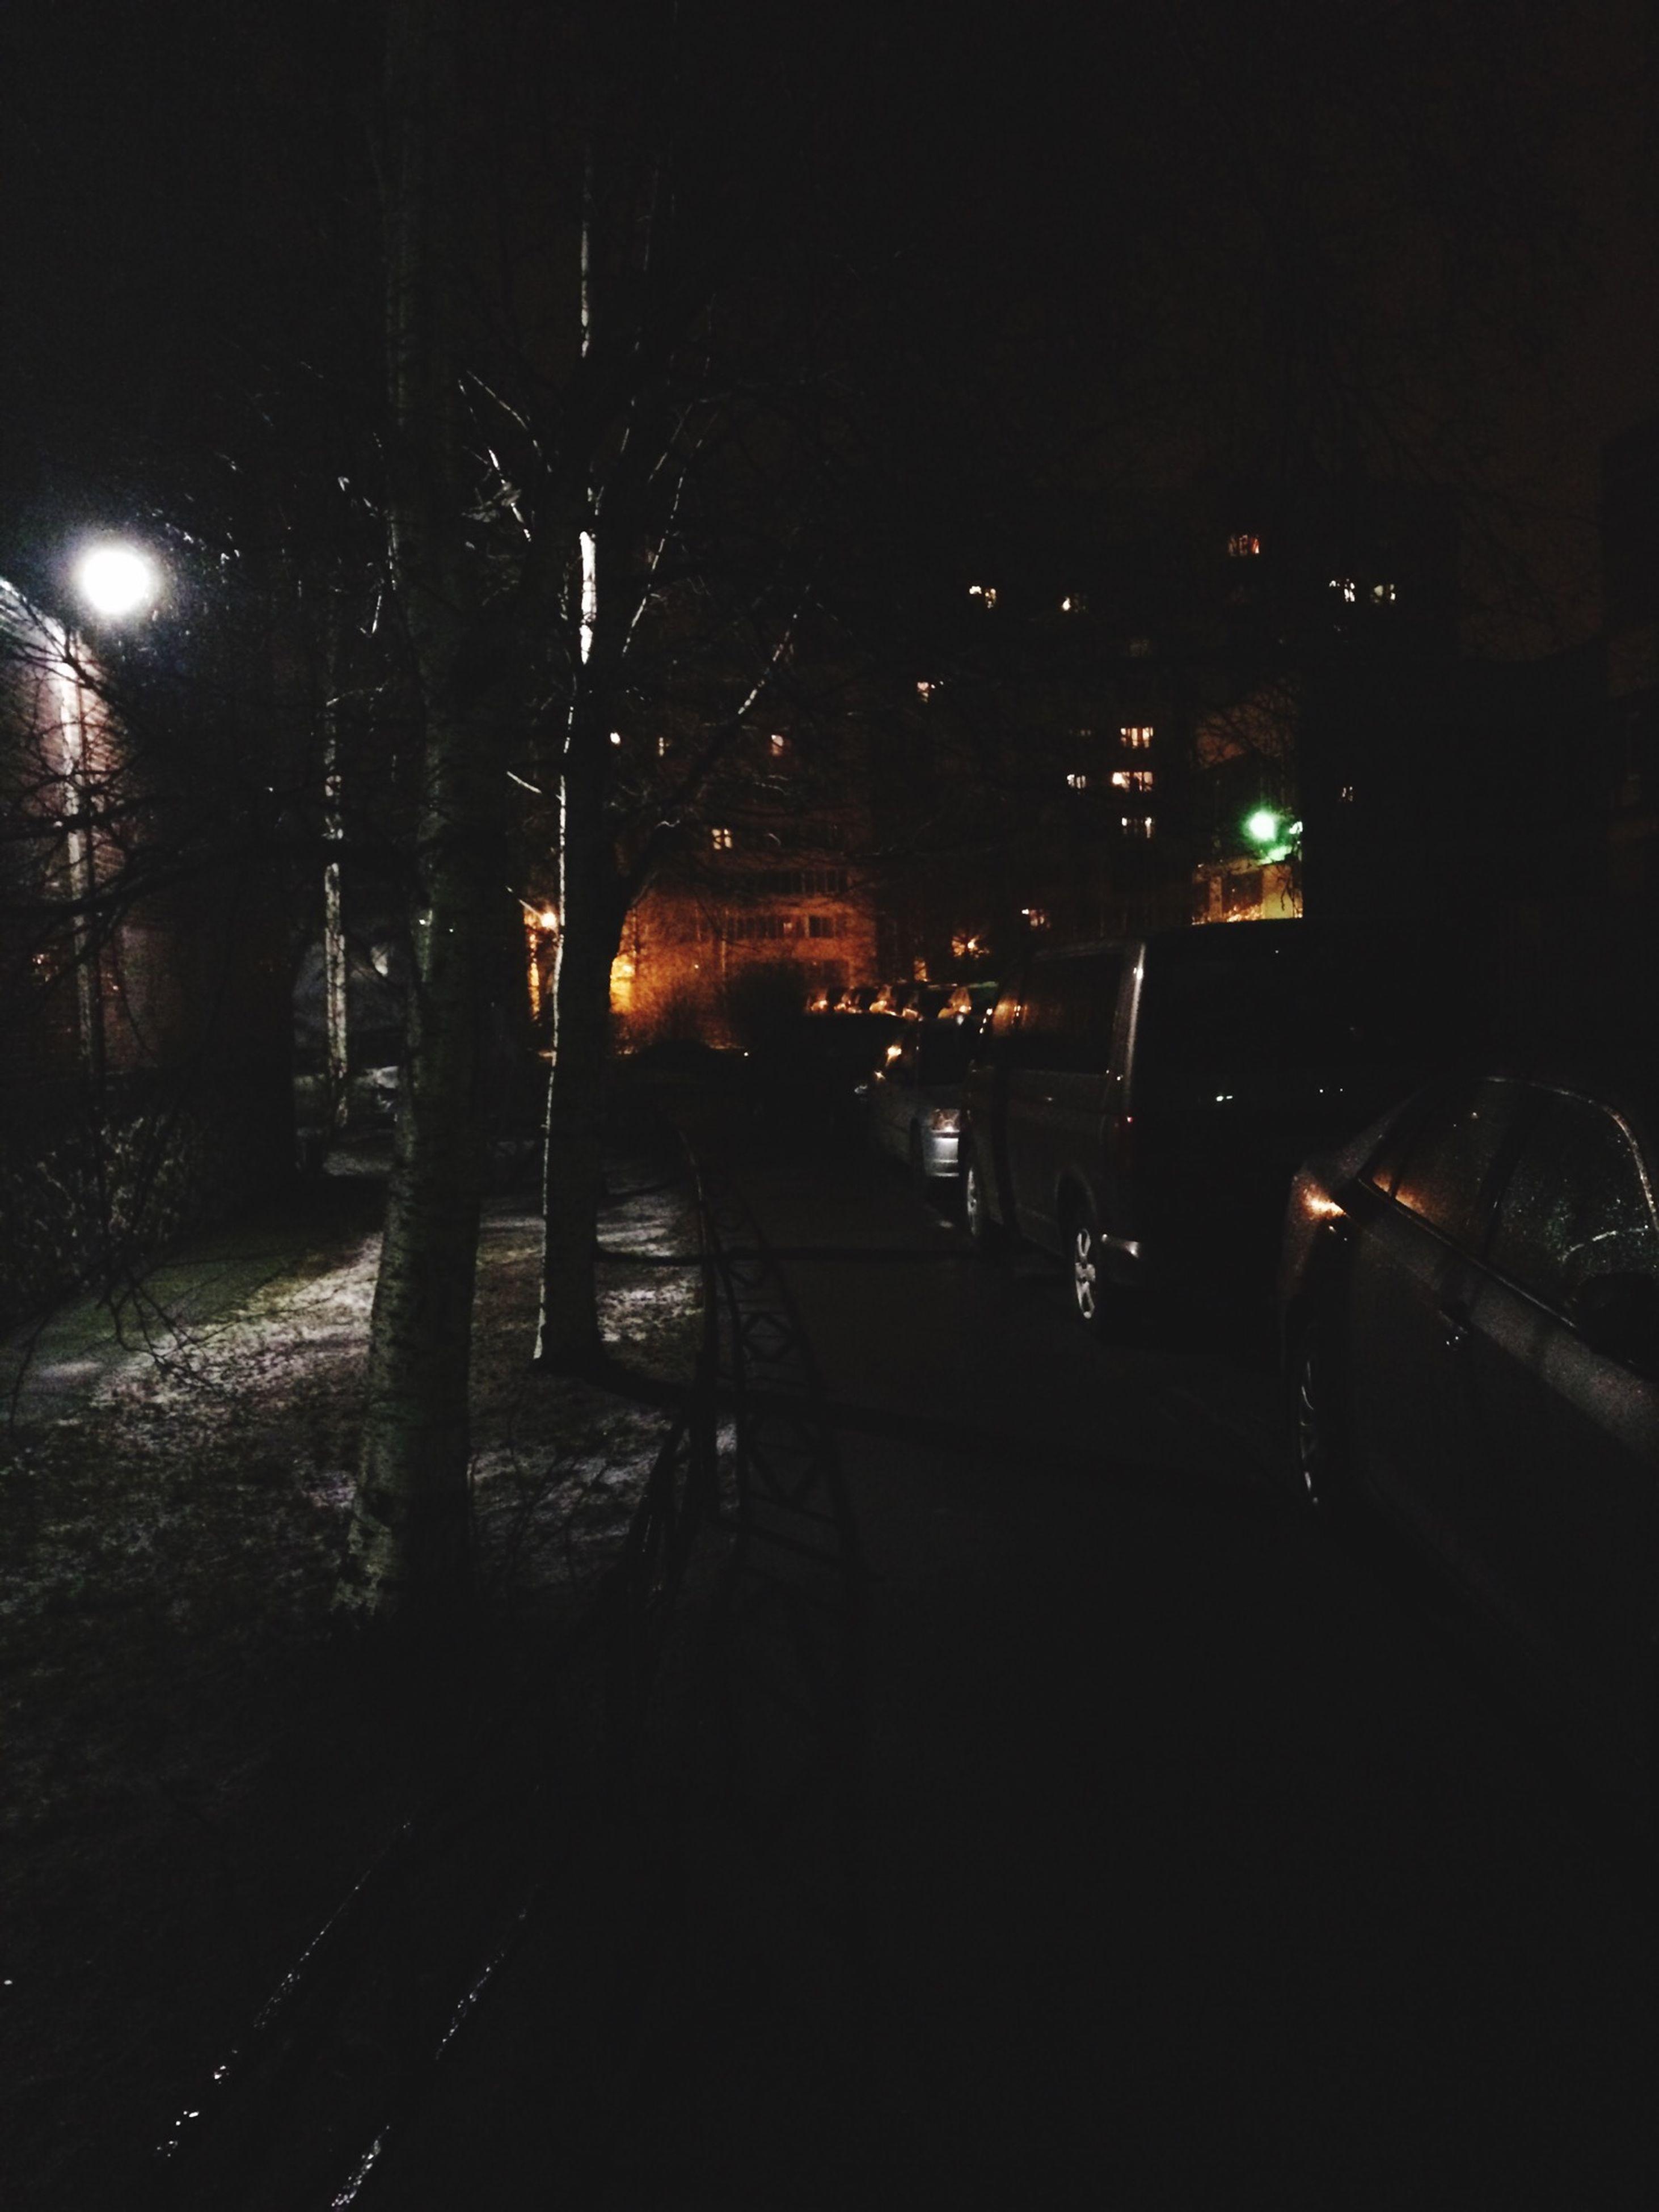 night, illuminated, dark, tree, street, transportation, street light, road, building exterior, silhouette, city, built structure, the way forward, architecture, outdoors, car, city life, land vehicle, lighting equipment